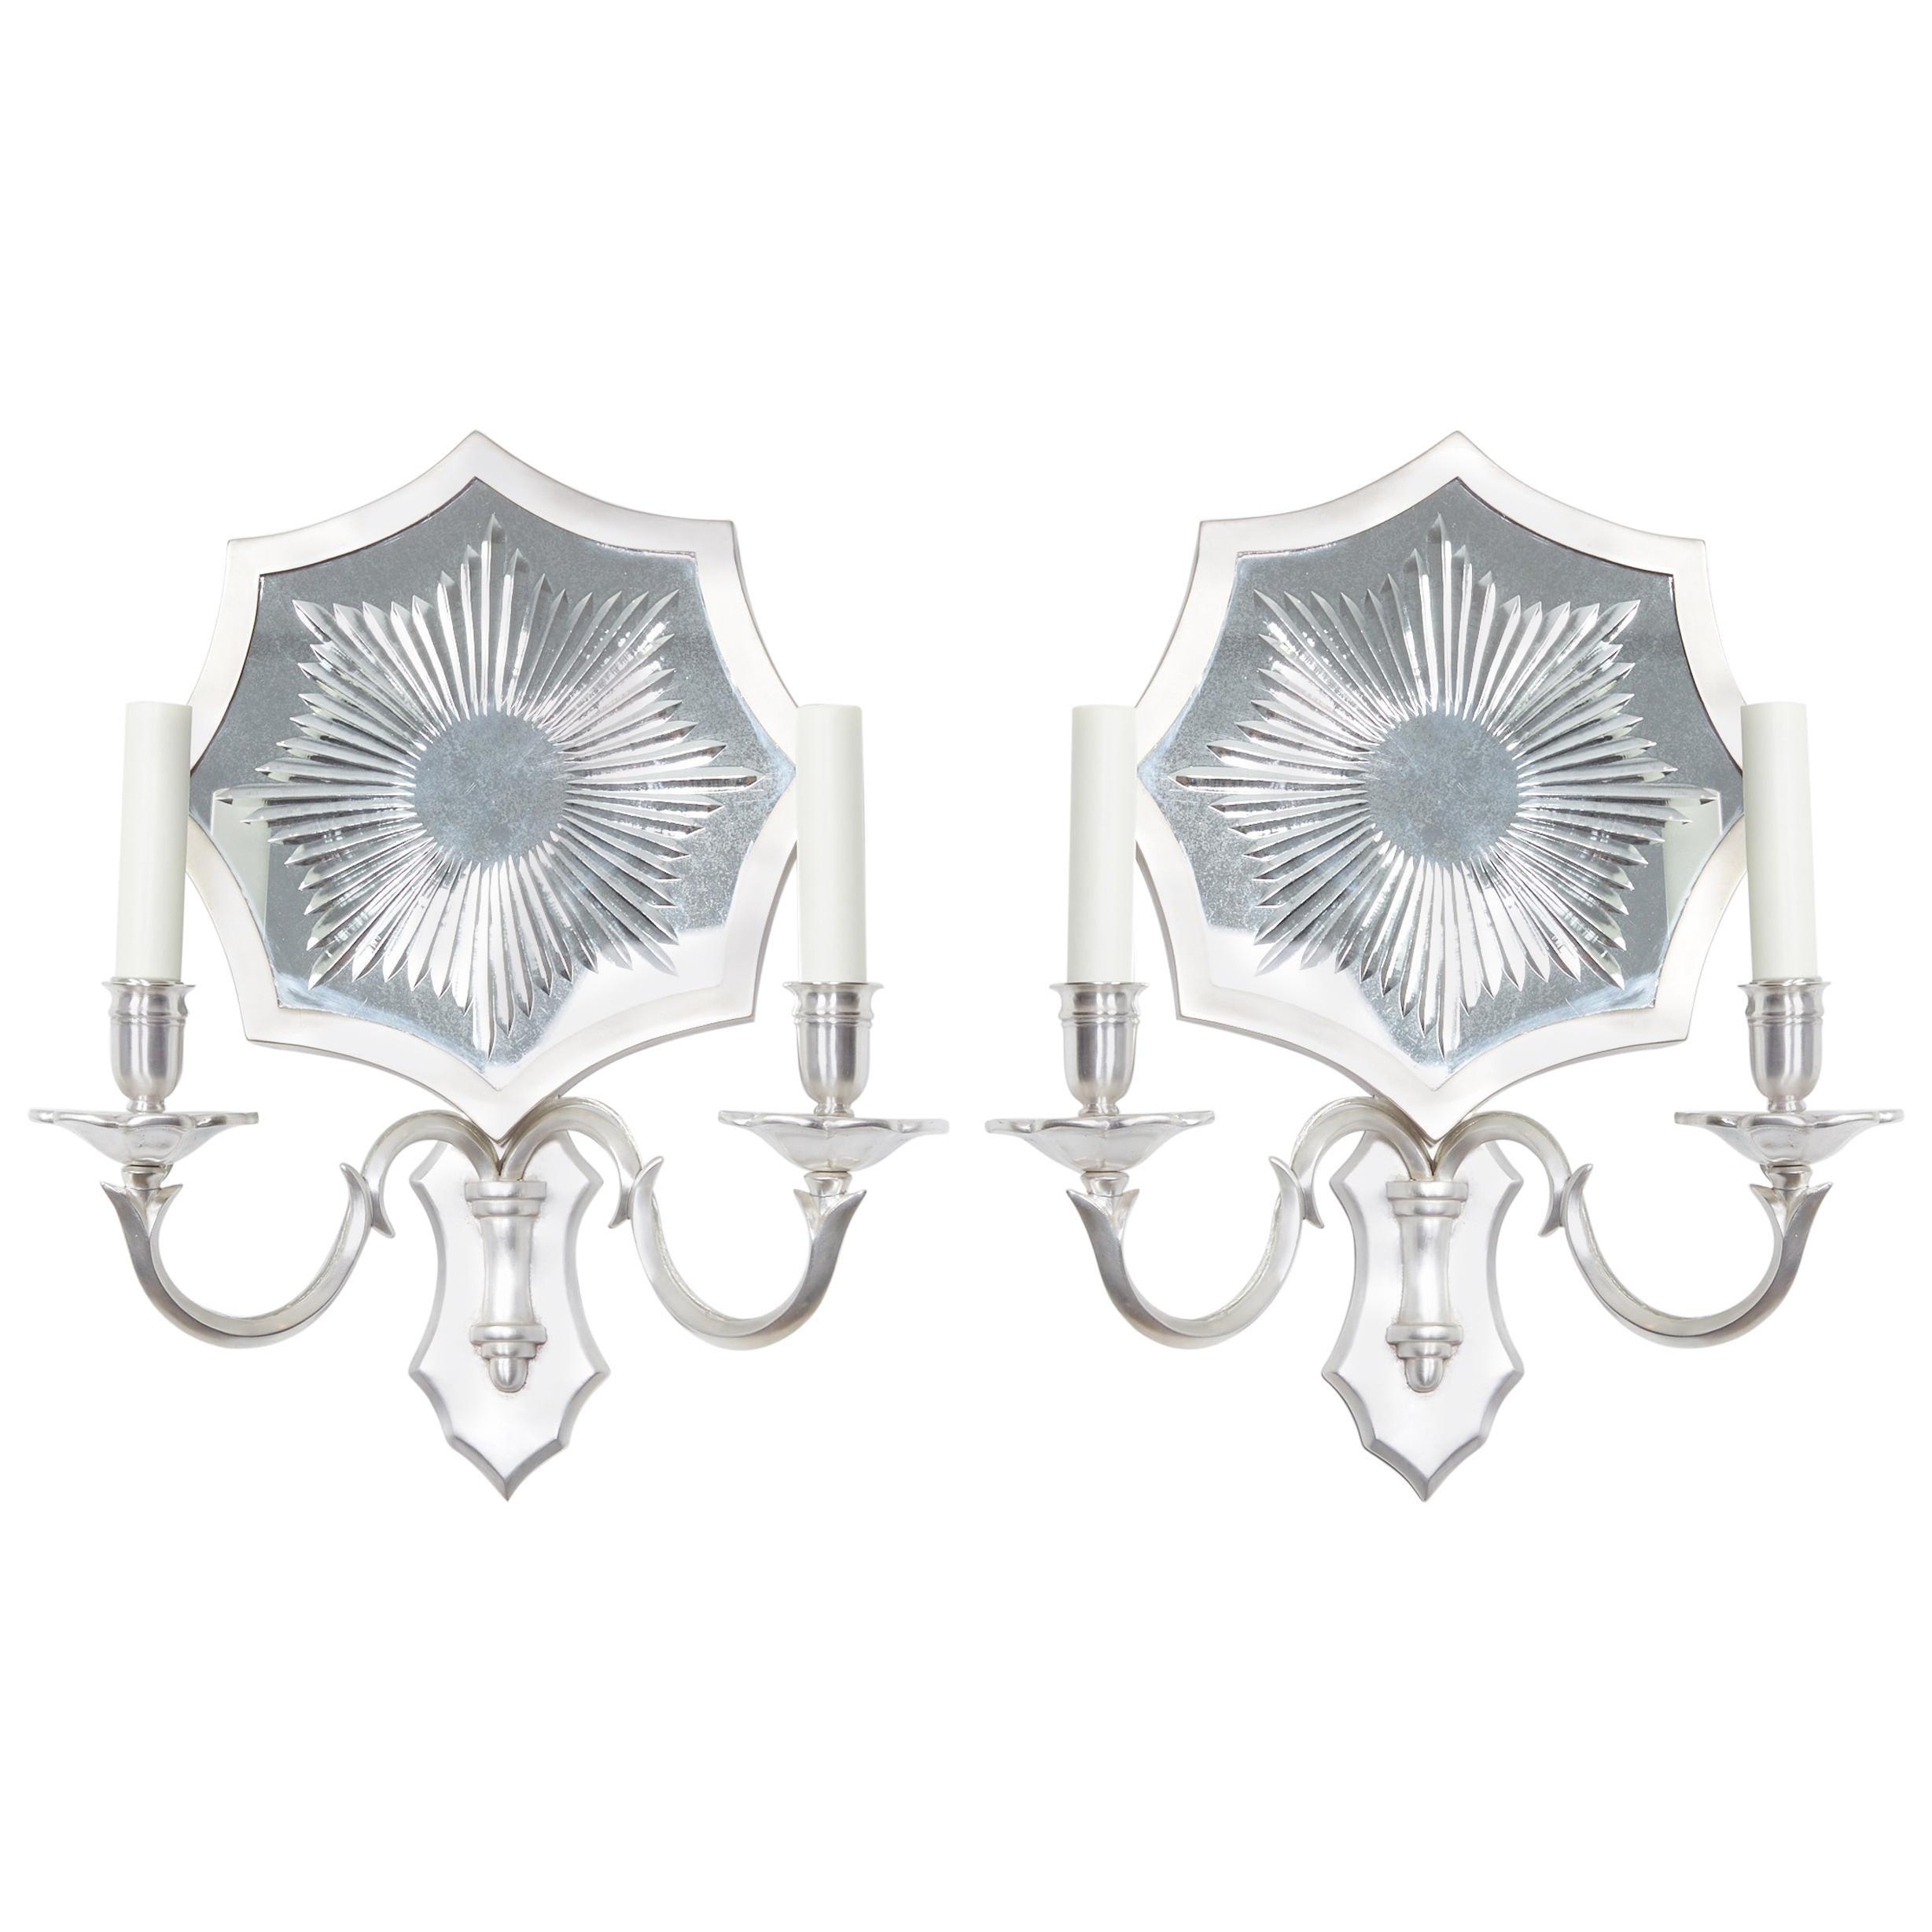 Pair of Mirrored Sunburst Sconces by David Duncan